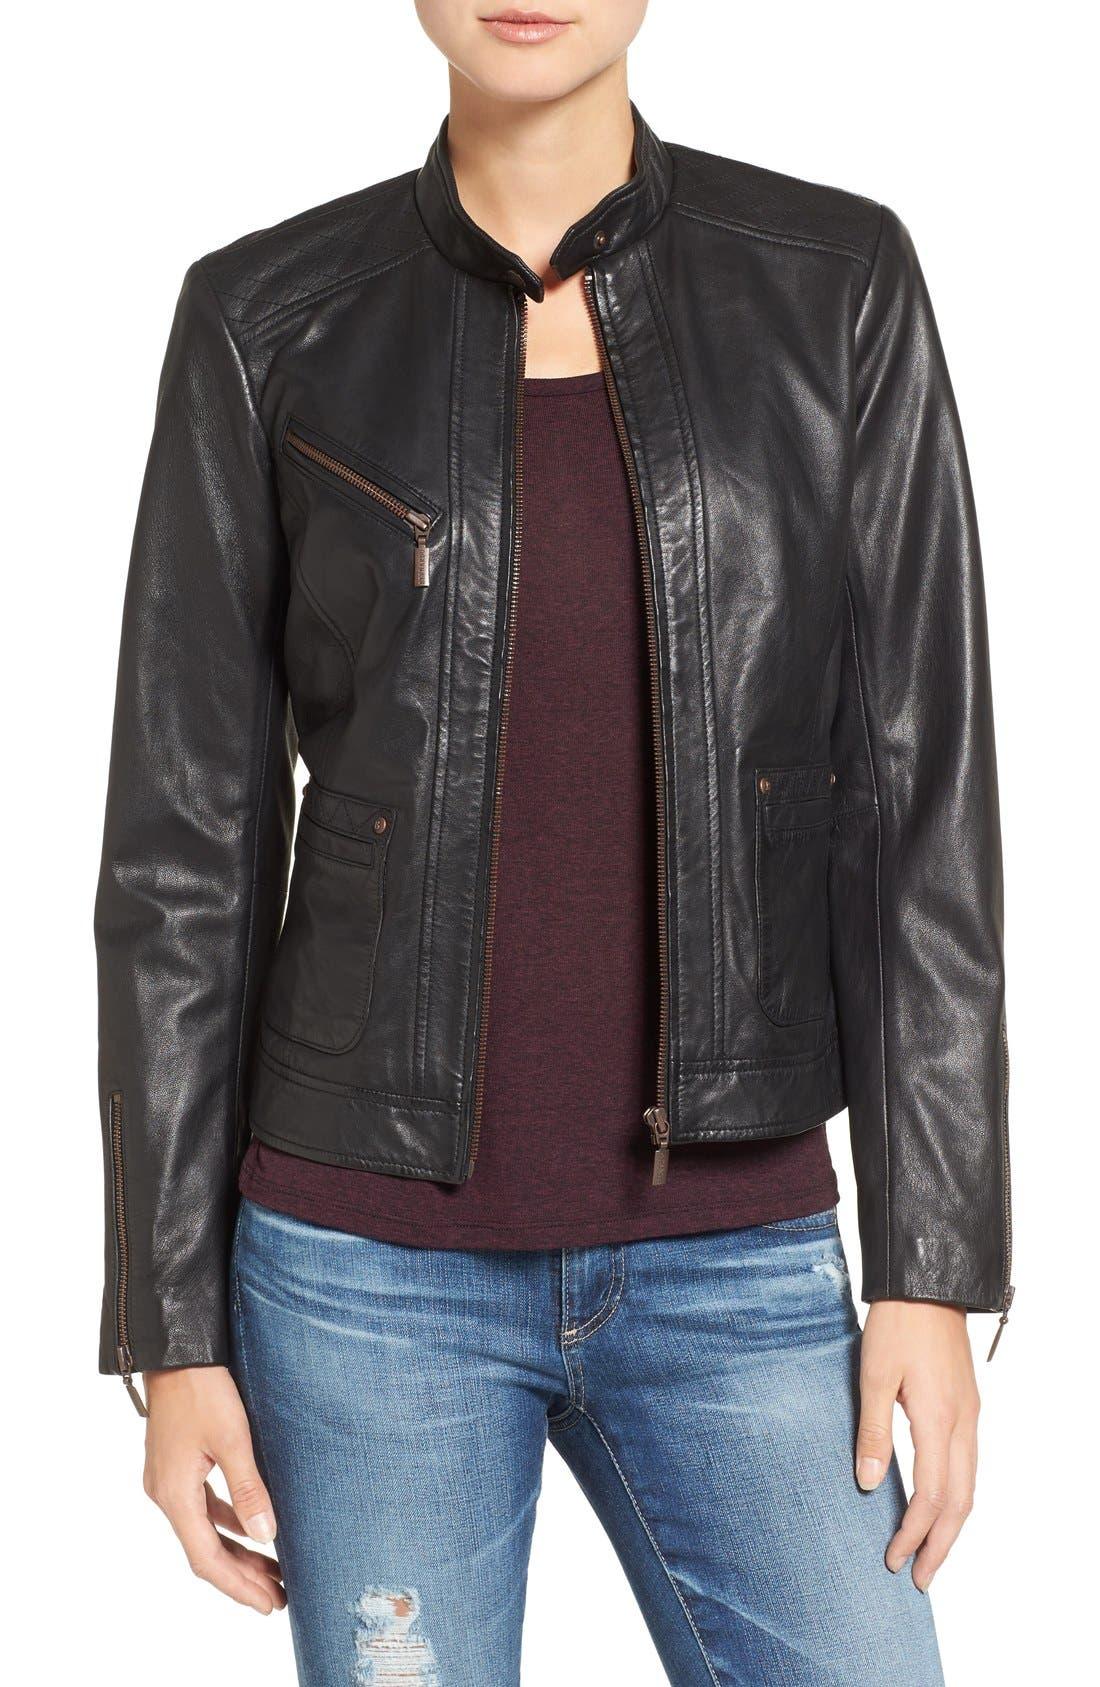 Alternate Image 1 Selected - Bernardo Kirwin Leather Jacket (Regular & Petite)